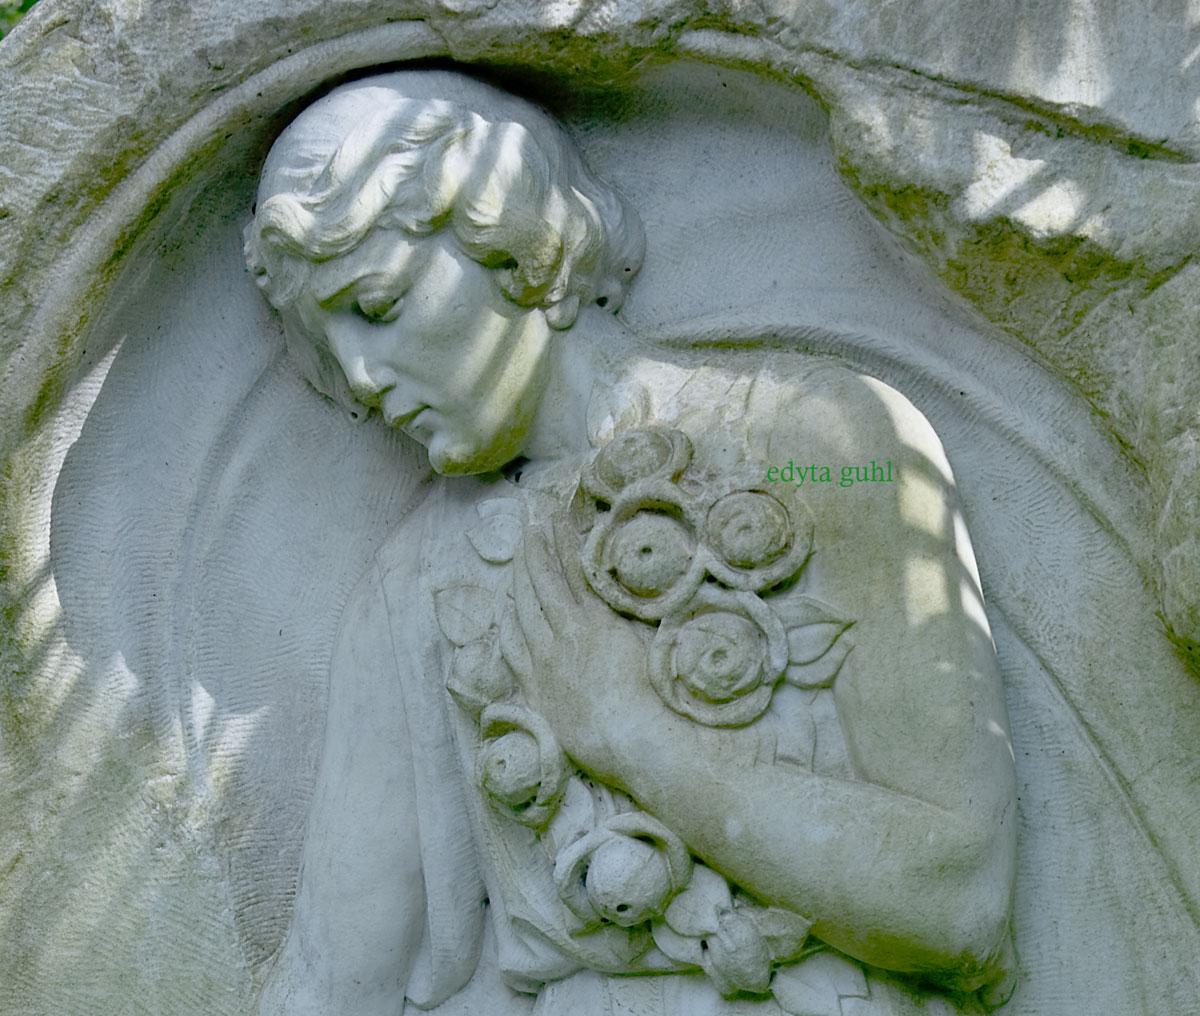 Melatenfriedhof in Kön. Edyta Guhl.